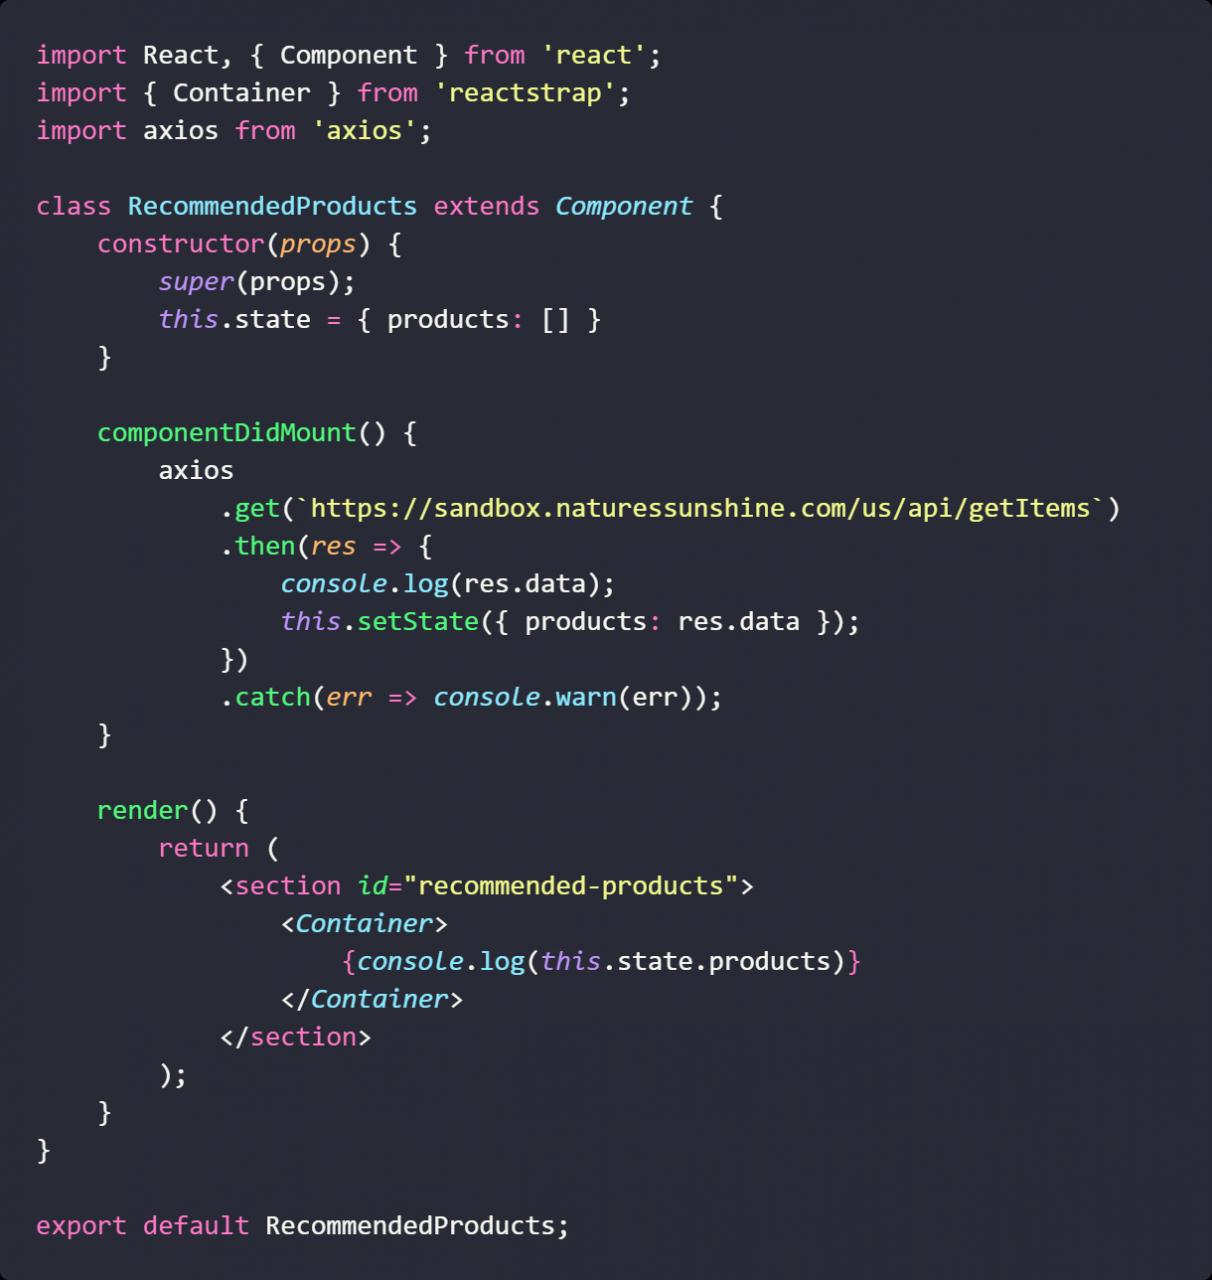 CORS API error cross-origin policy